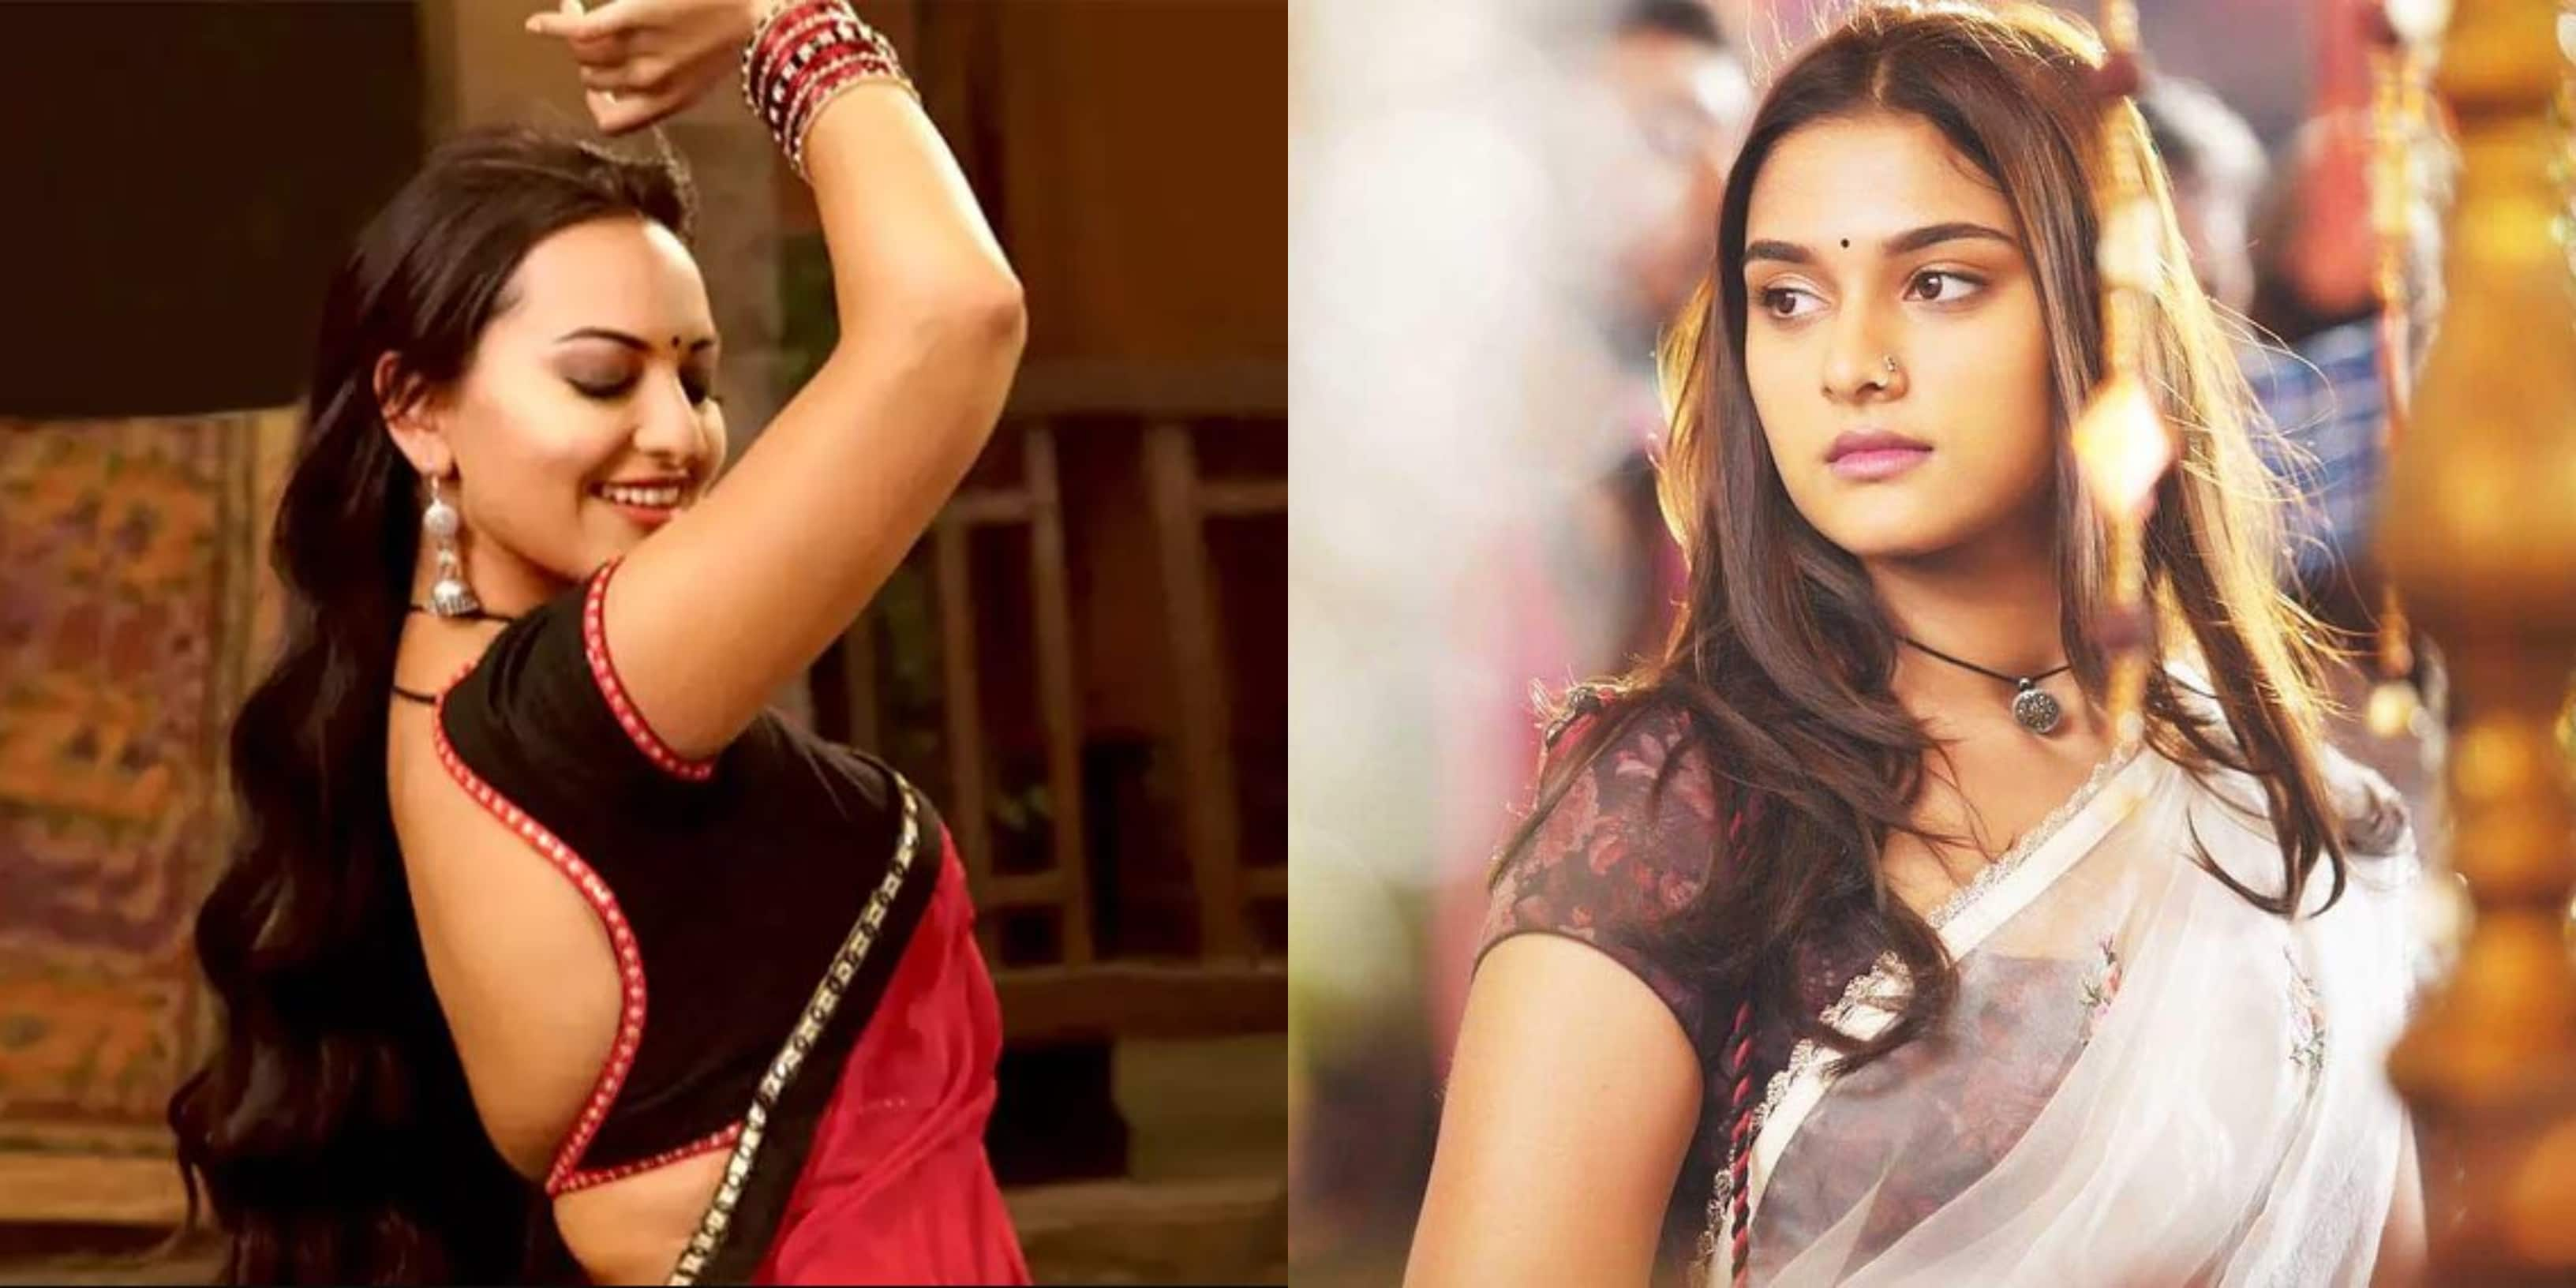 EXCLUSIVE: Salman Khan Reveals The Similarity Between Sonakshi Sinha In Dabangg And Saiee Manjrekar In Dabangg 3